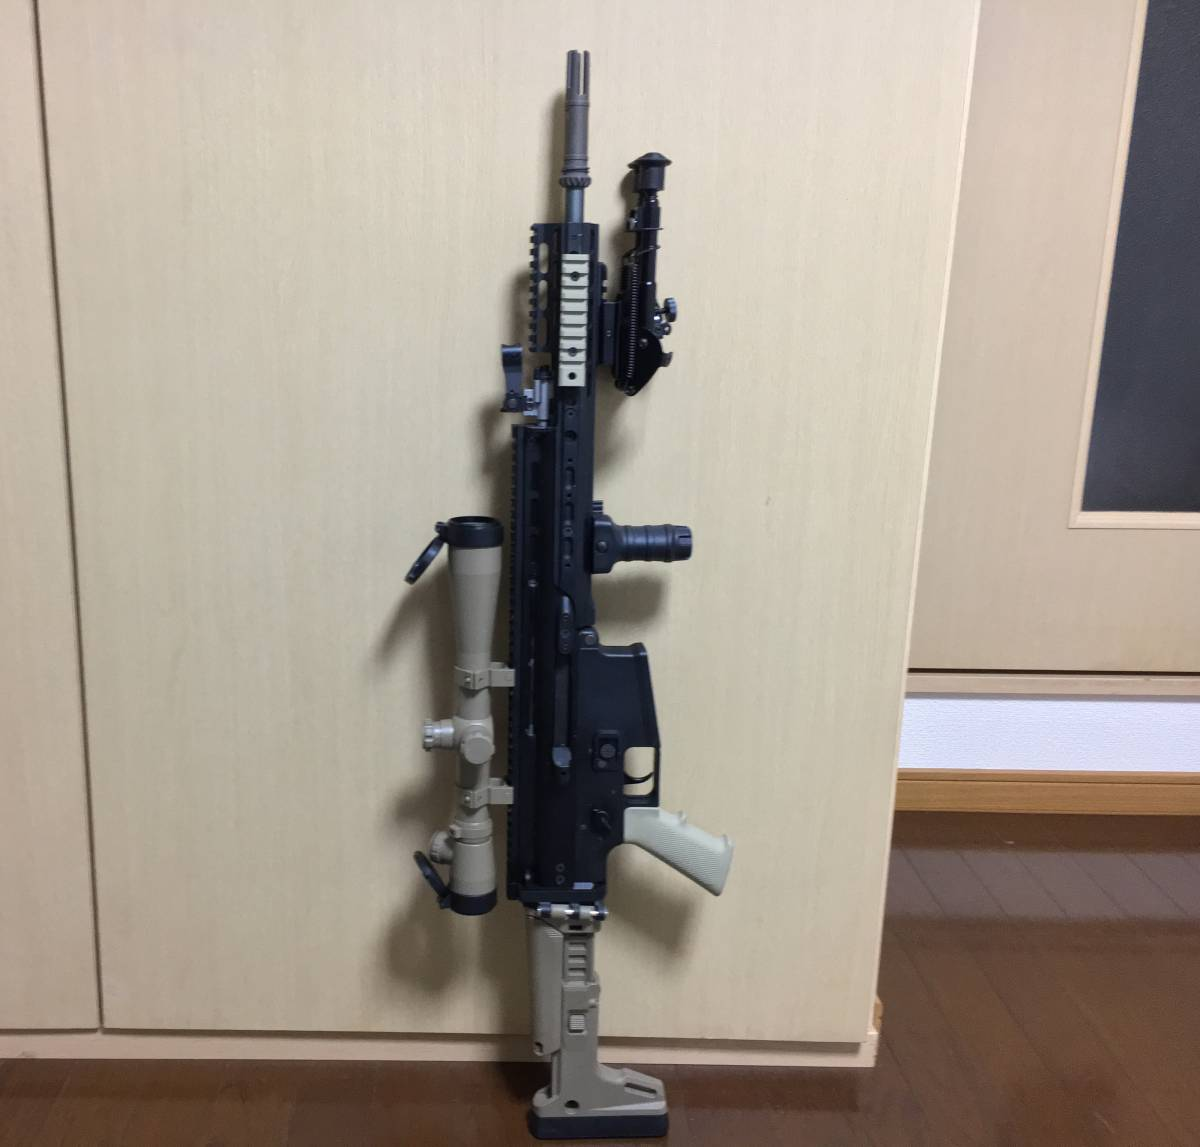 WE SCAR H スナイパーライフル フルカスタム 豪華付属品多数 M14 M4 MK17 SCAR L スカー_画像3